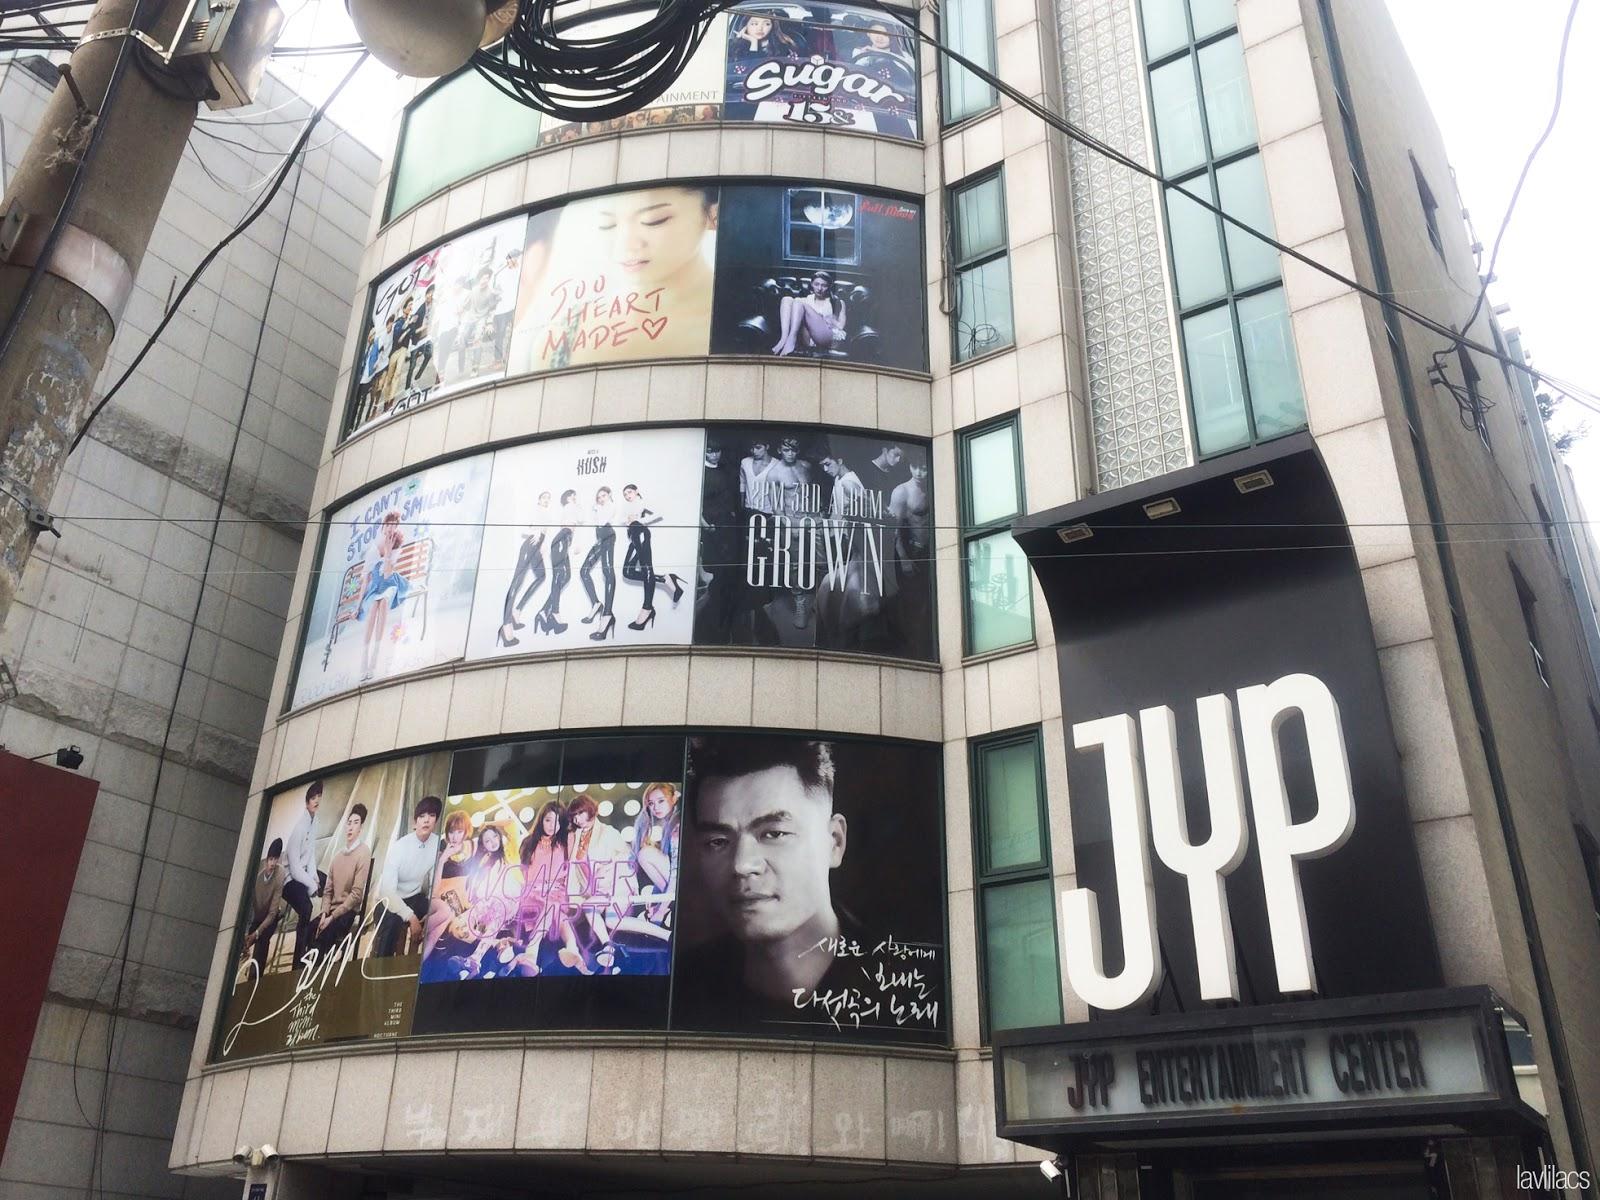 Seoul, Korea - Summer Study Abroad 2014 - JYP Entertainment building